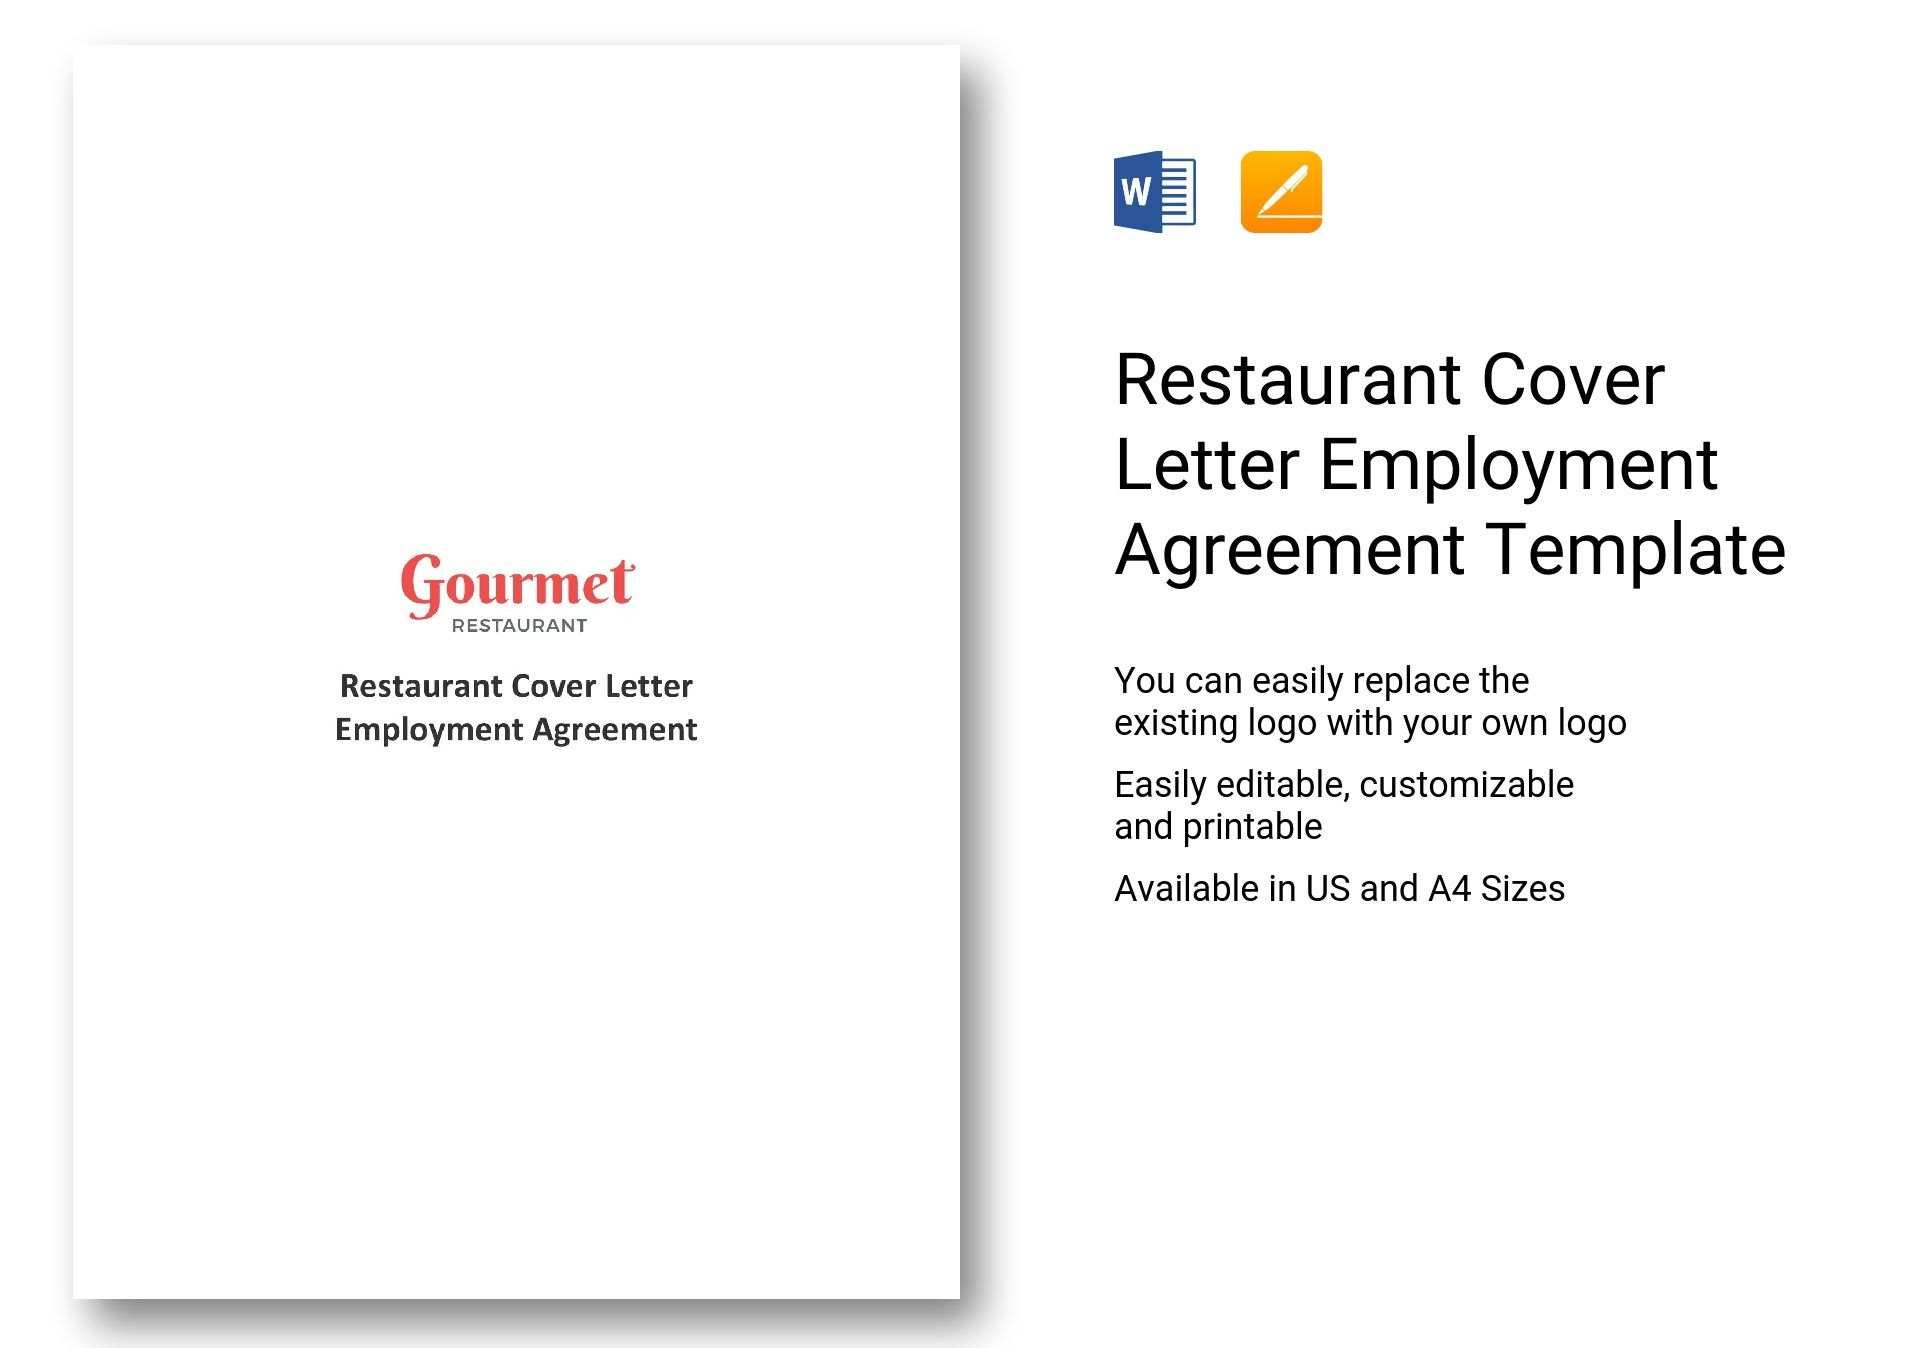 Restaurant Cover Letter Employment Agreement